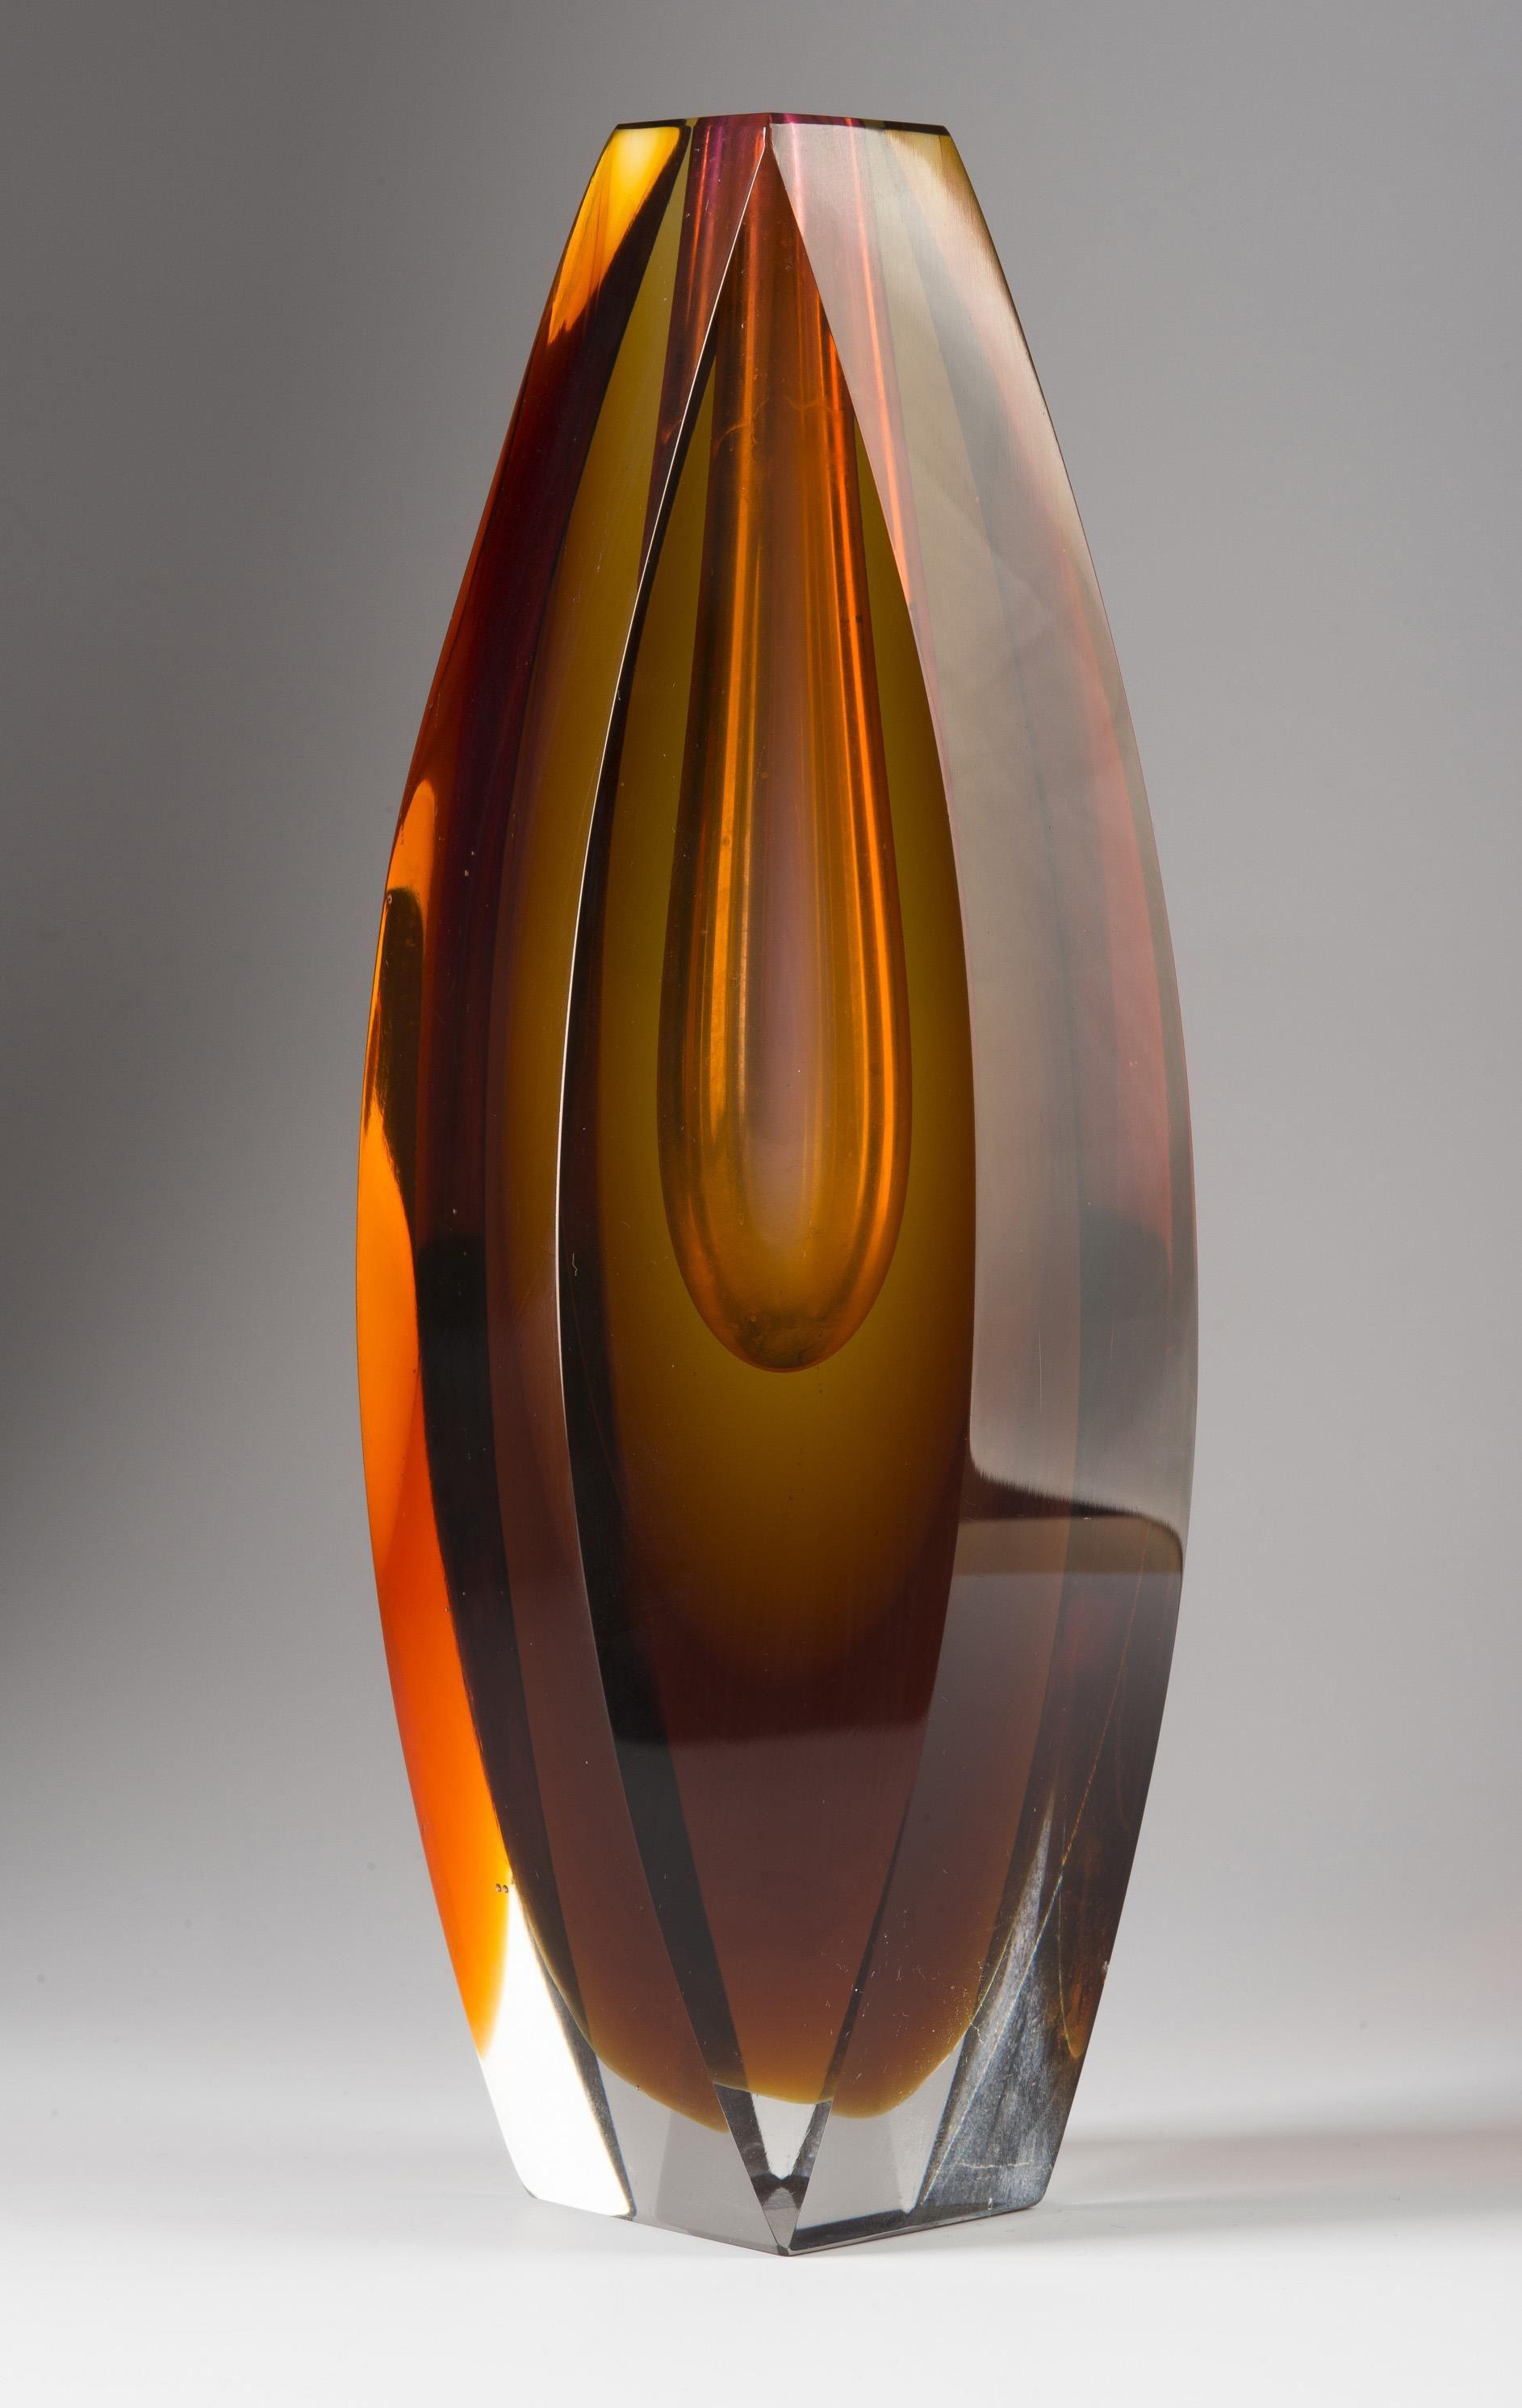 czech glass vase of jan kotik sommerso glass vase 60s h 225 cm glassworks zelezny for jan kotik sommerso glass vase 60s h 225 cm glassworks zelezny brod eisenbrod czechoslovakia